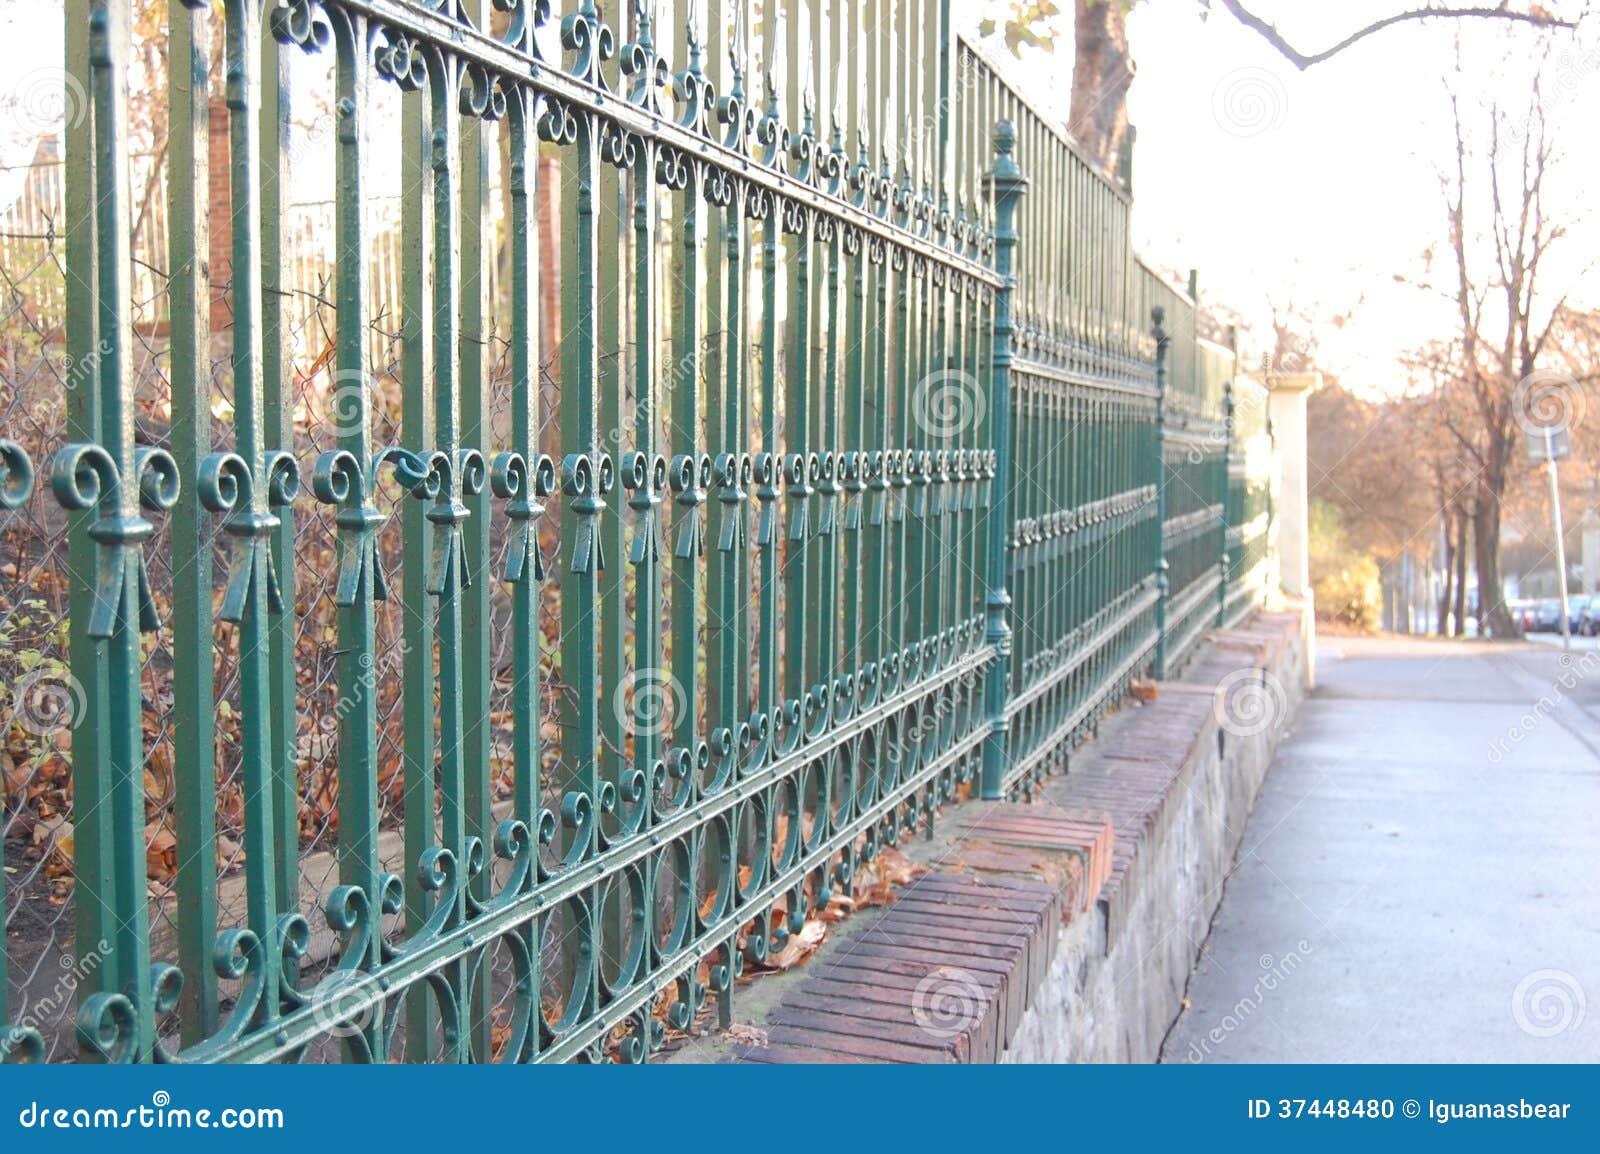 barri re en m tal avec la peinture verte photo stock image 37448480. Black Bedroom Furniture Sets. Home Design Ideas